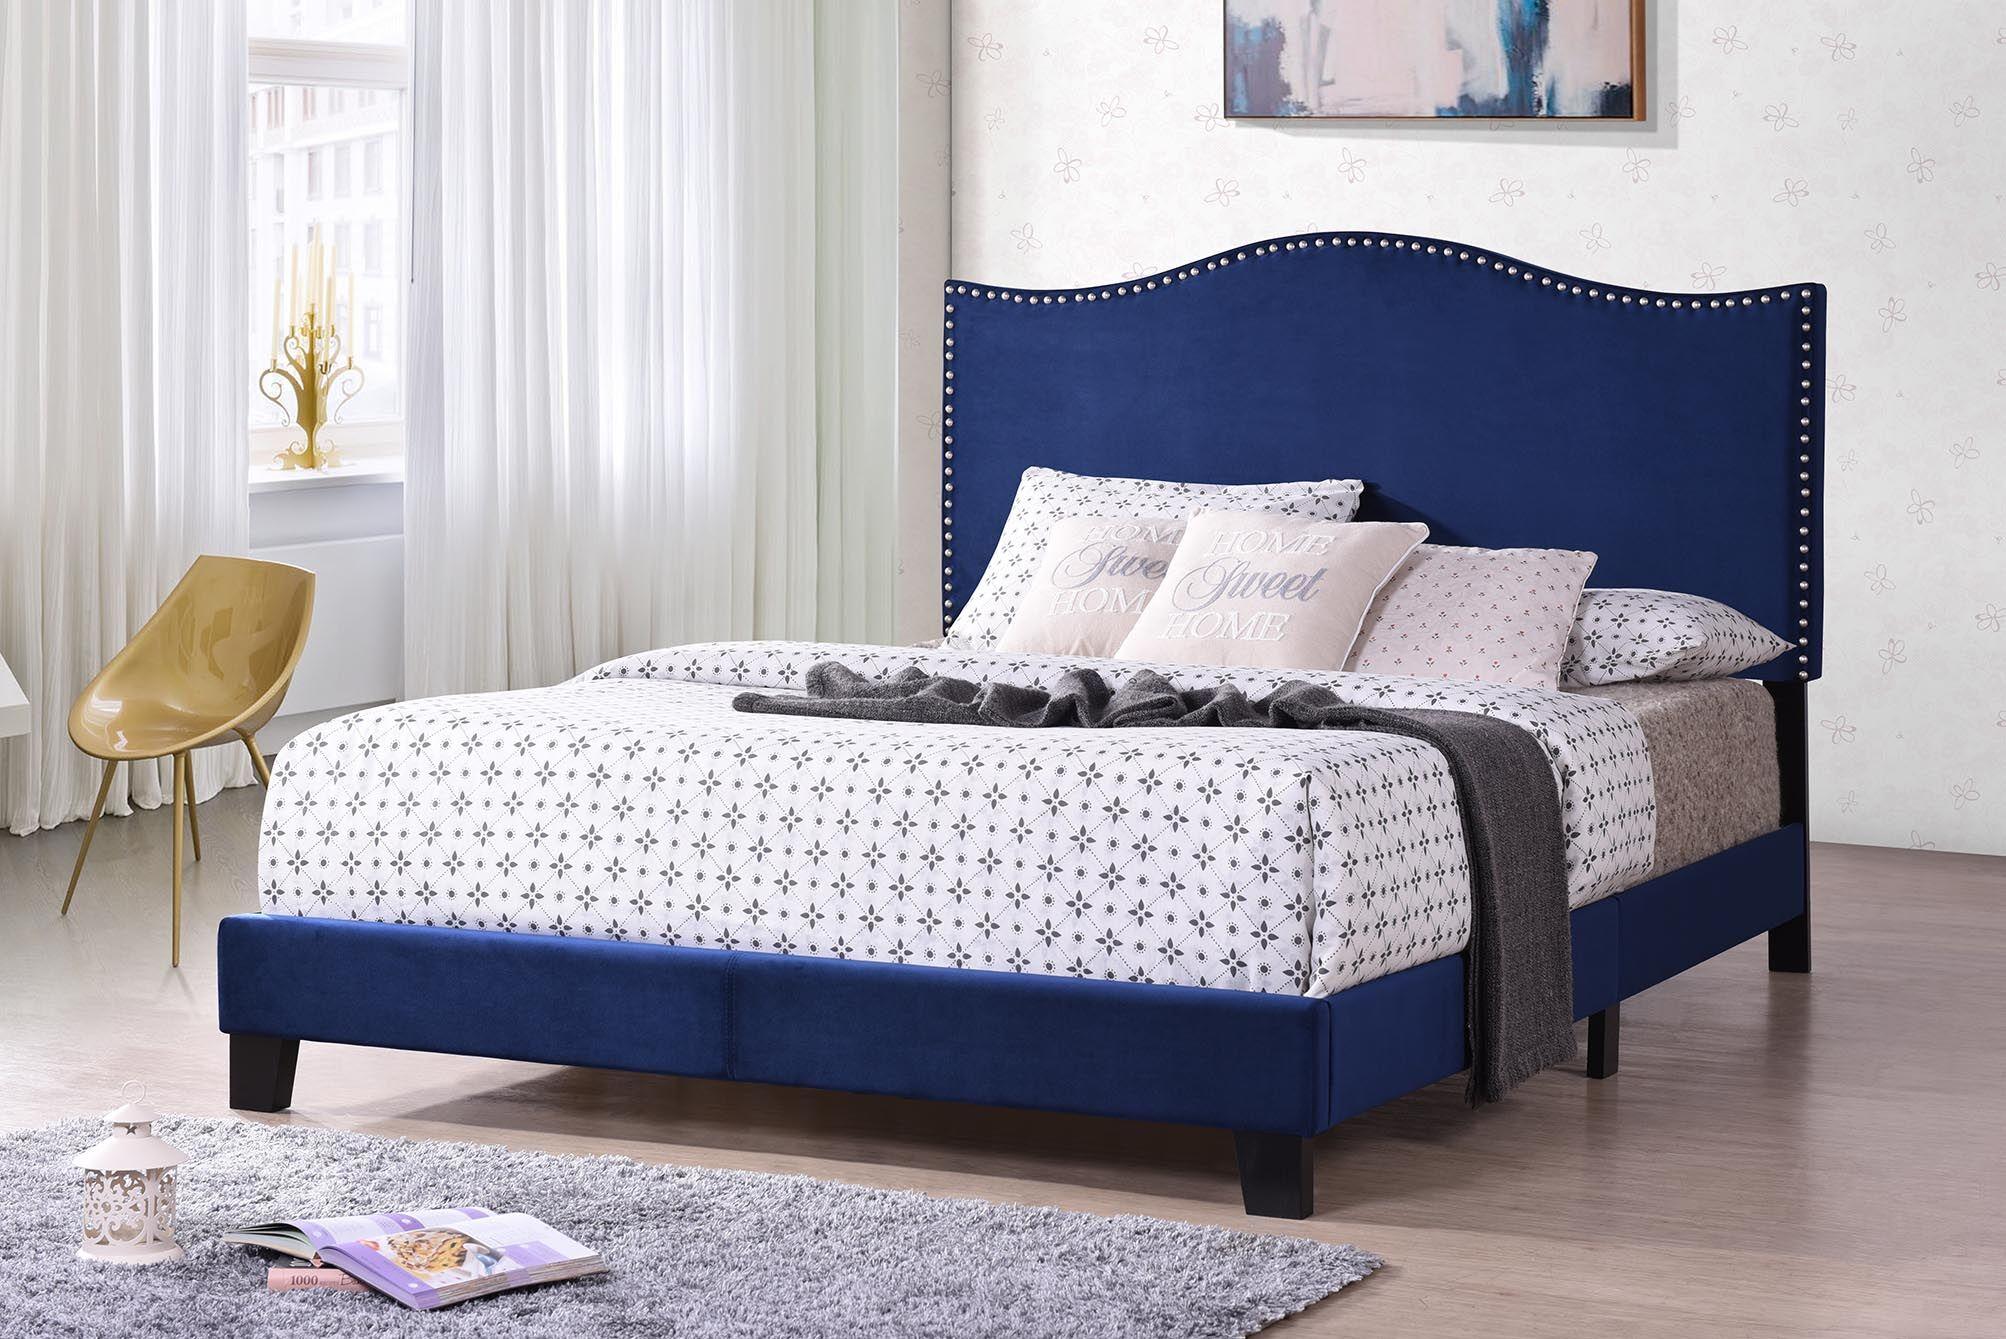 Henthorn Upholstered Bed Size: King